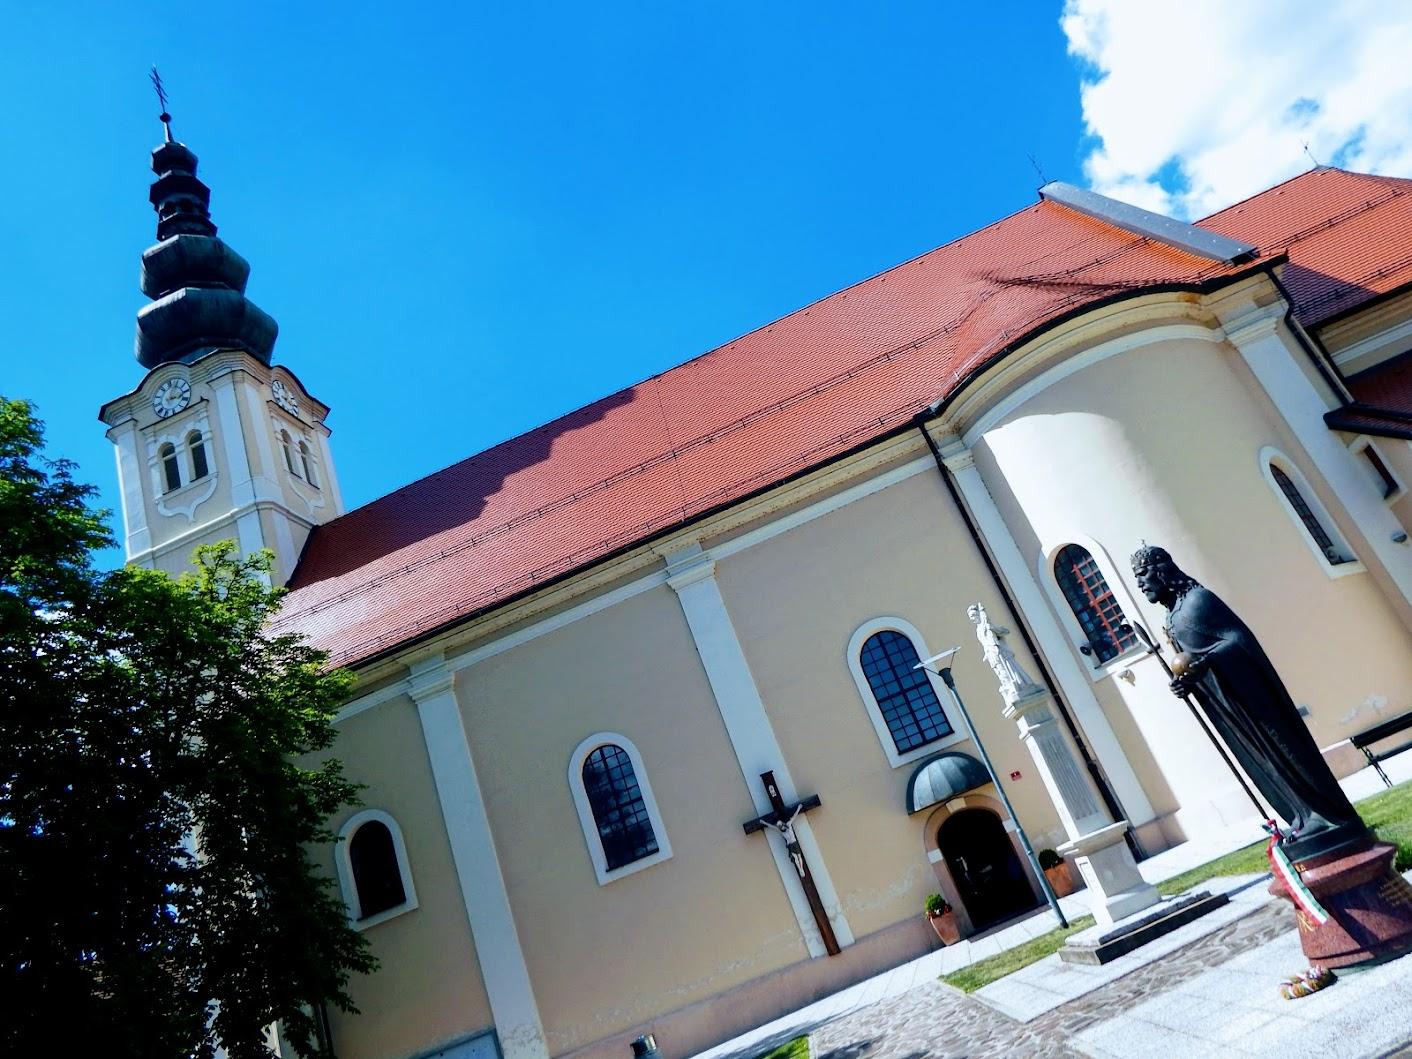 Lendava (Lendva) - cerkev sv. Katarine Aleksandrijske (Alexandriai Szent Katalin rk. templom)